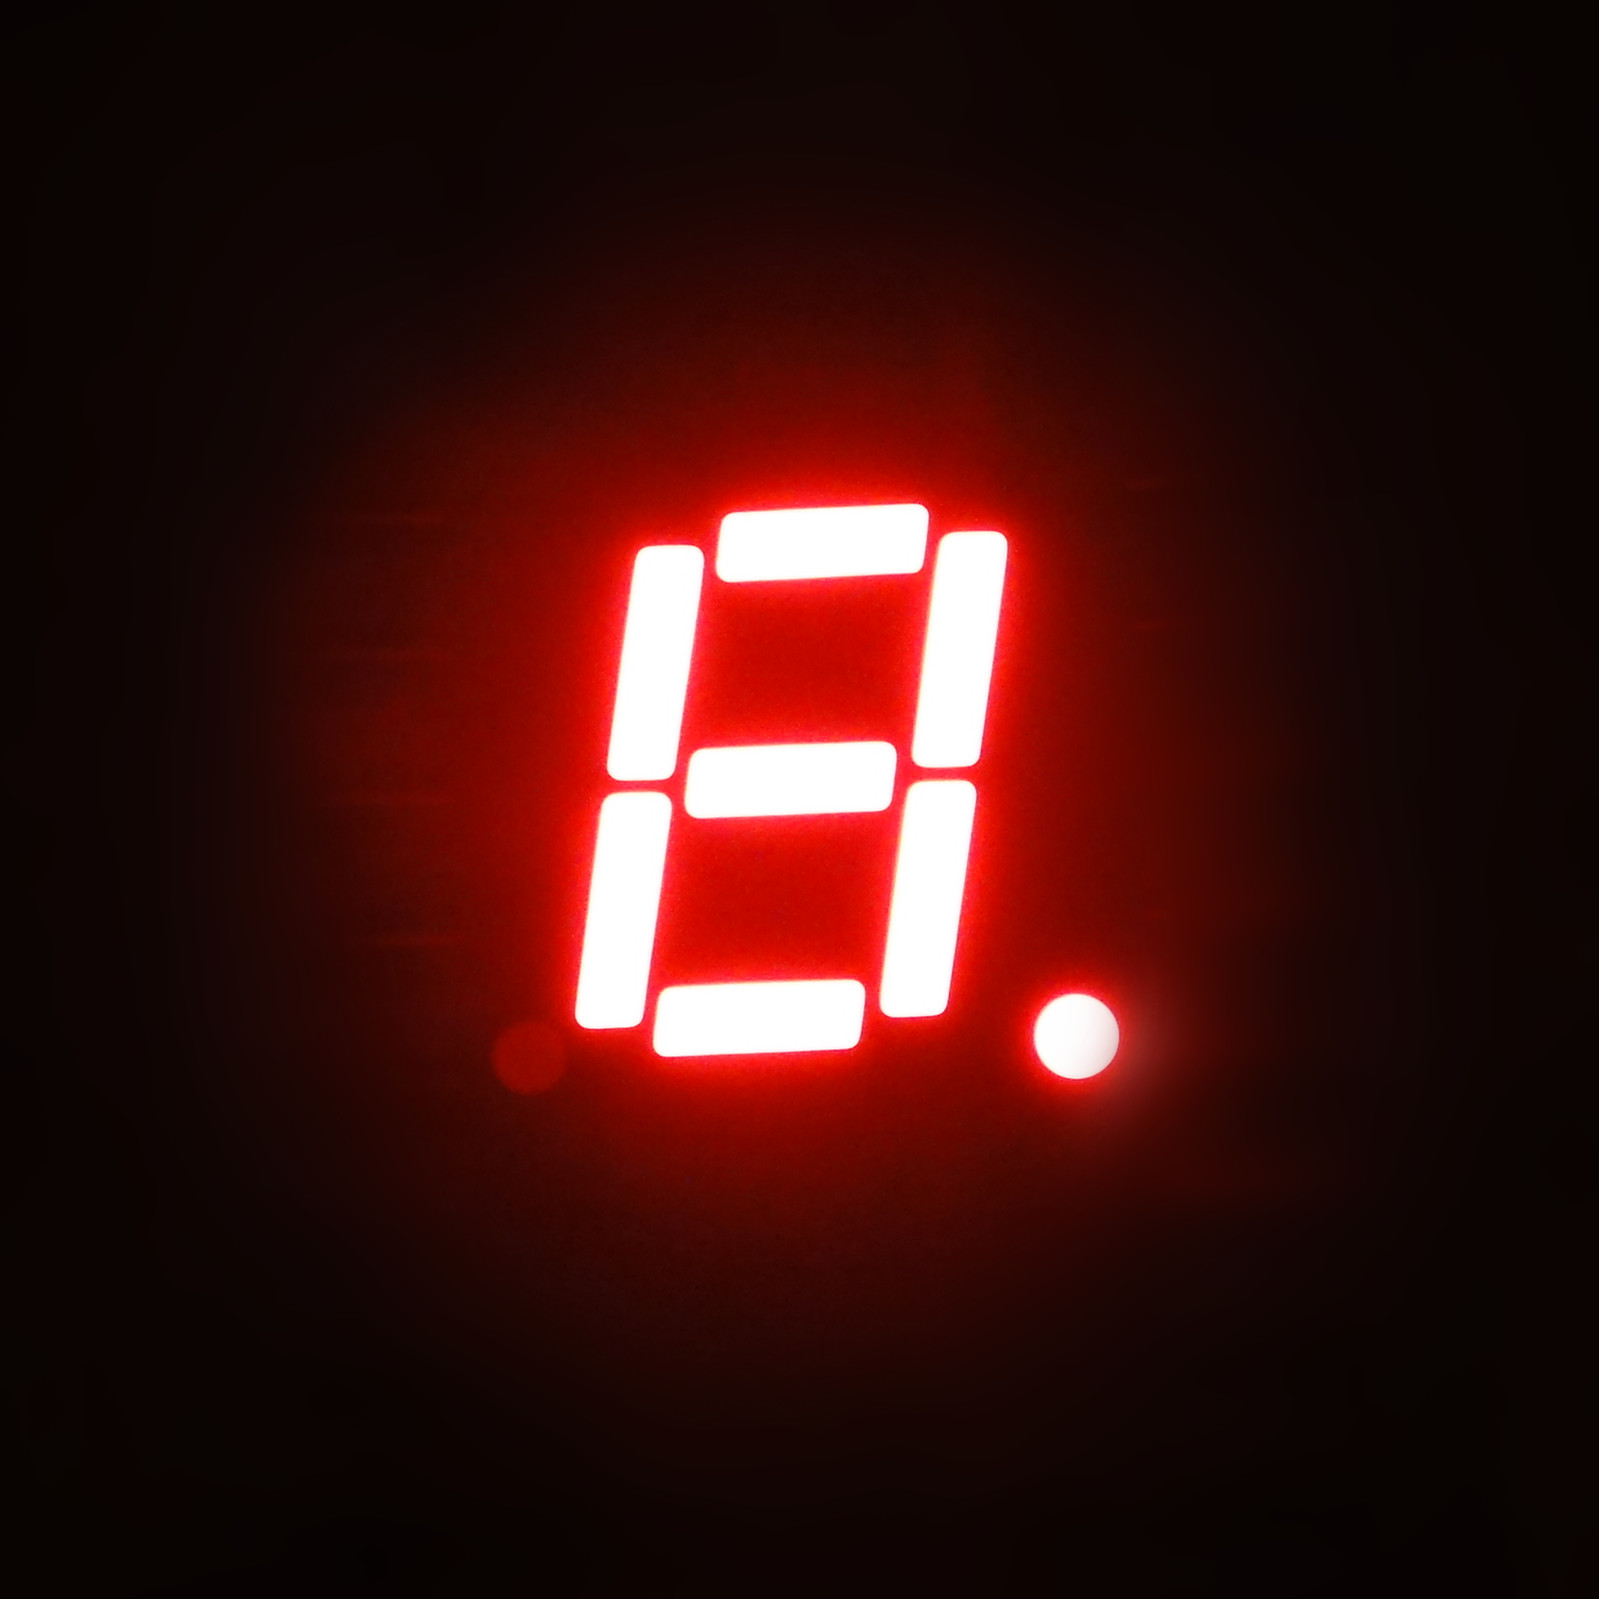 7 Segment LED Display 1 digit